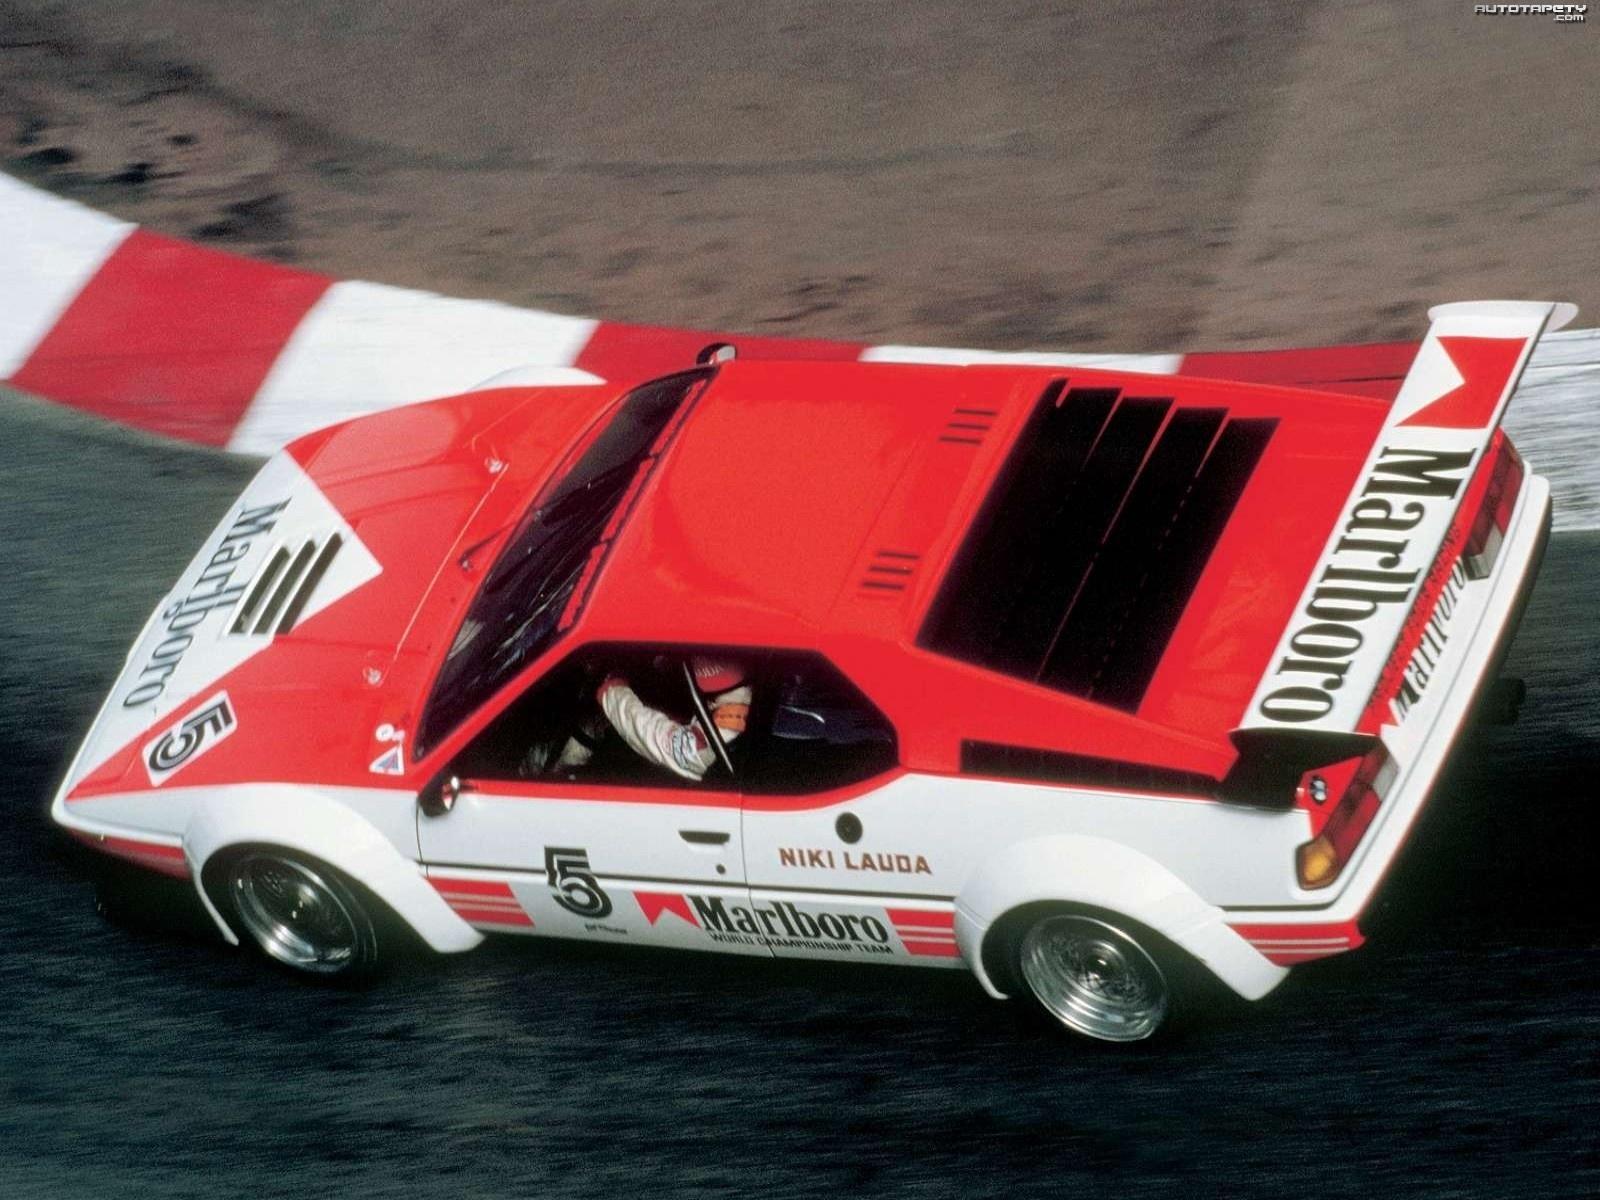 I 1979 ble Lauda procar-mester i sin Marlboro-sponsede BMW M1. Foto: BMW